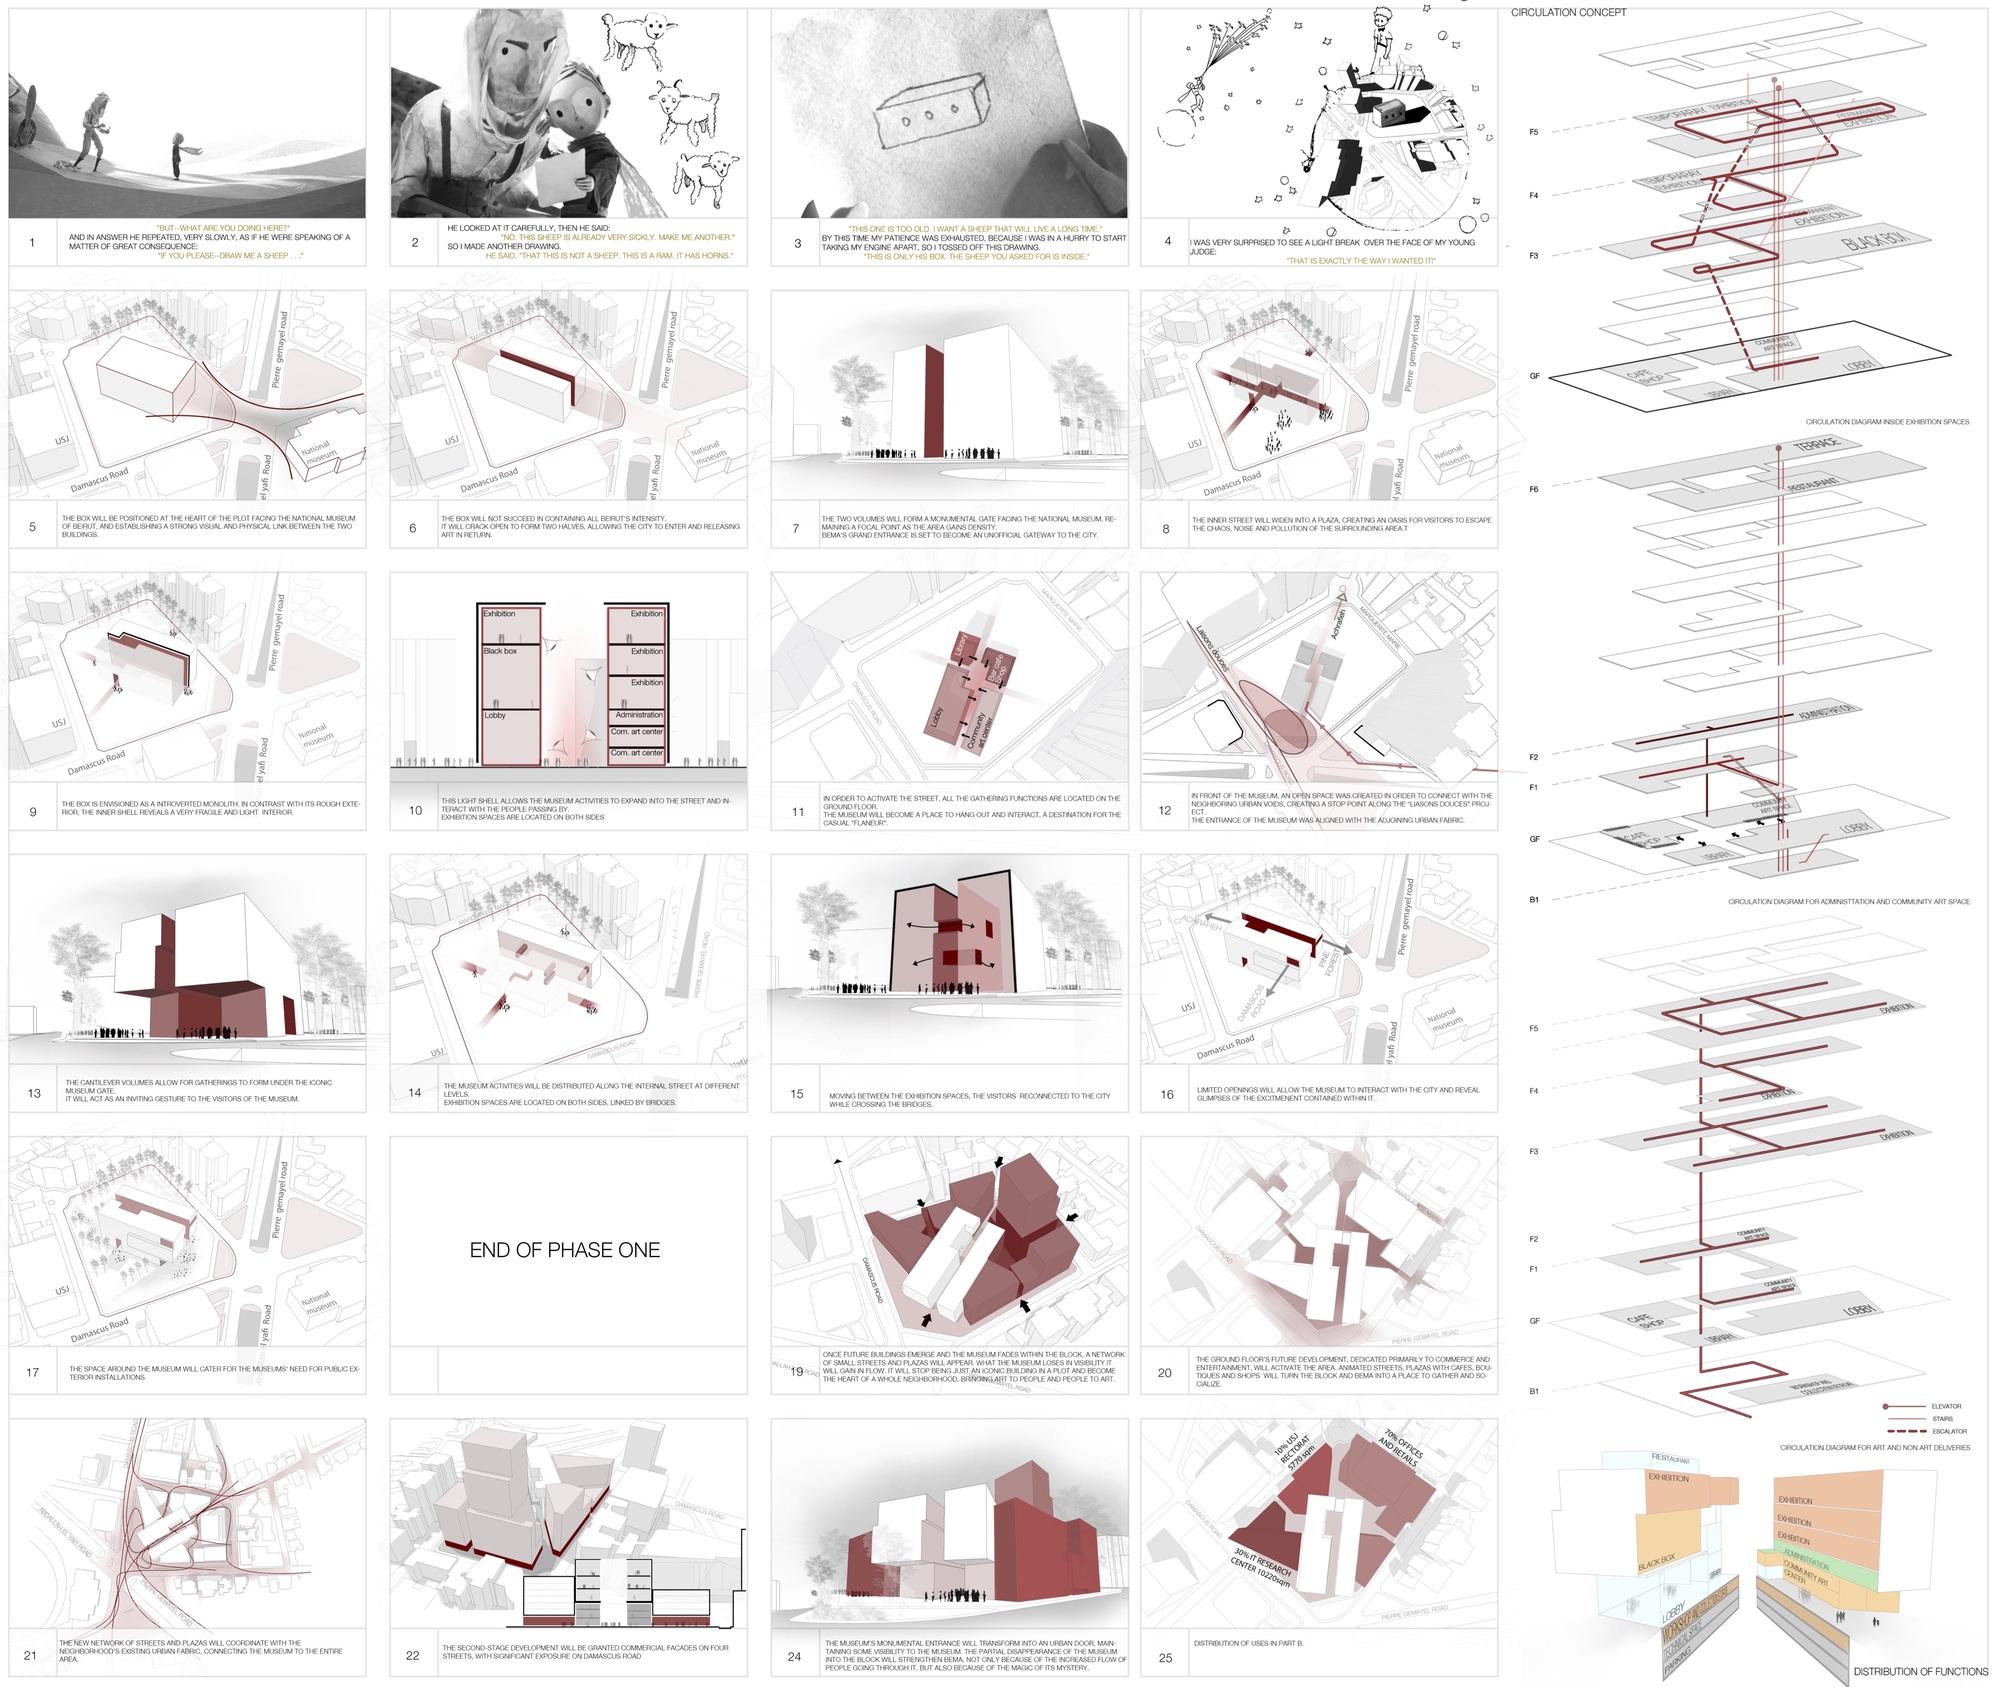 Gallery Of 109 Architectes Proposes Beirut Museum Design